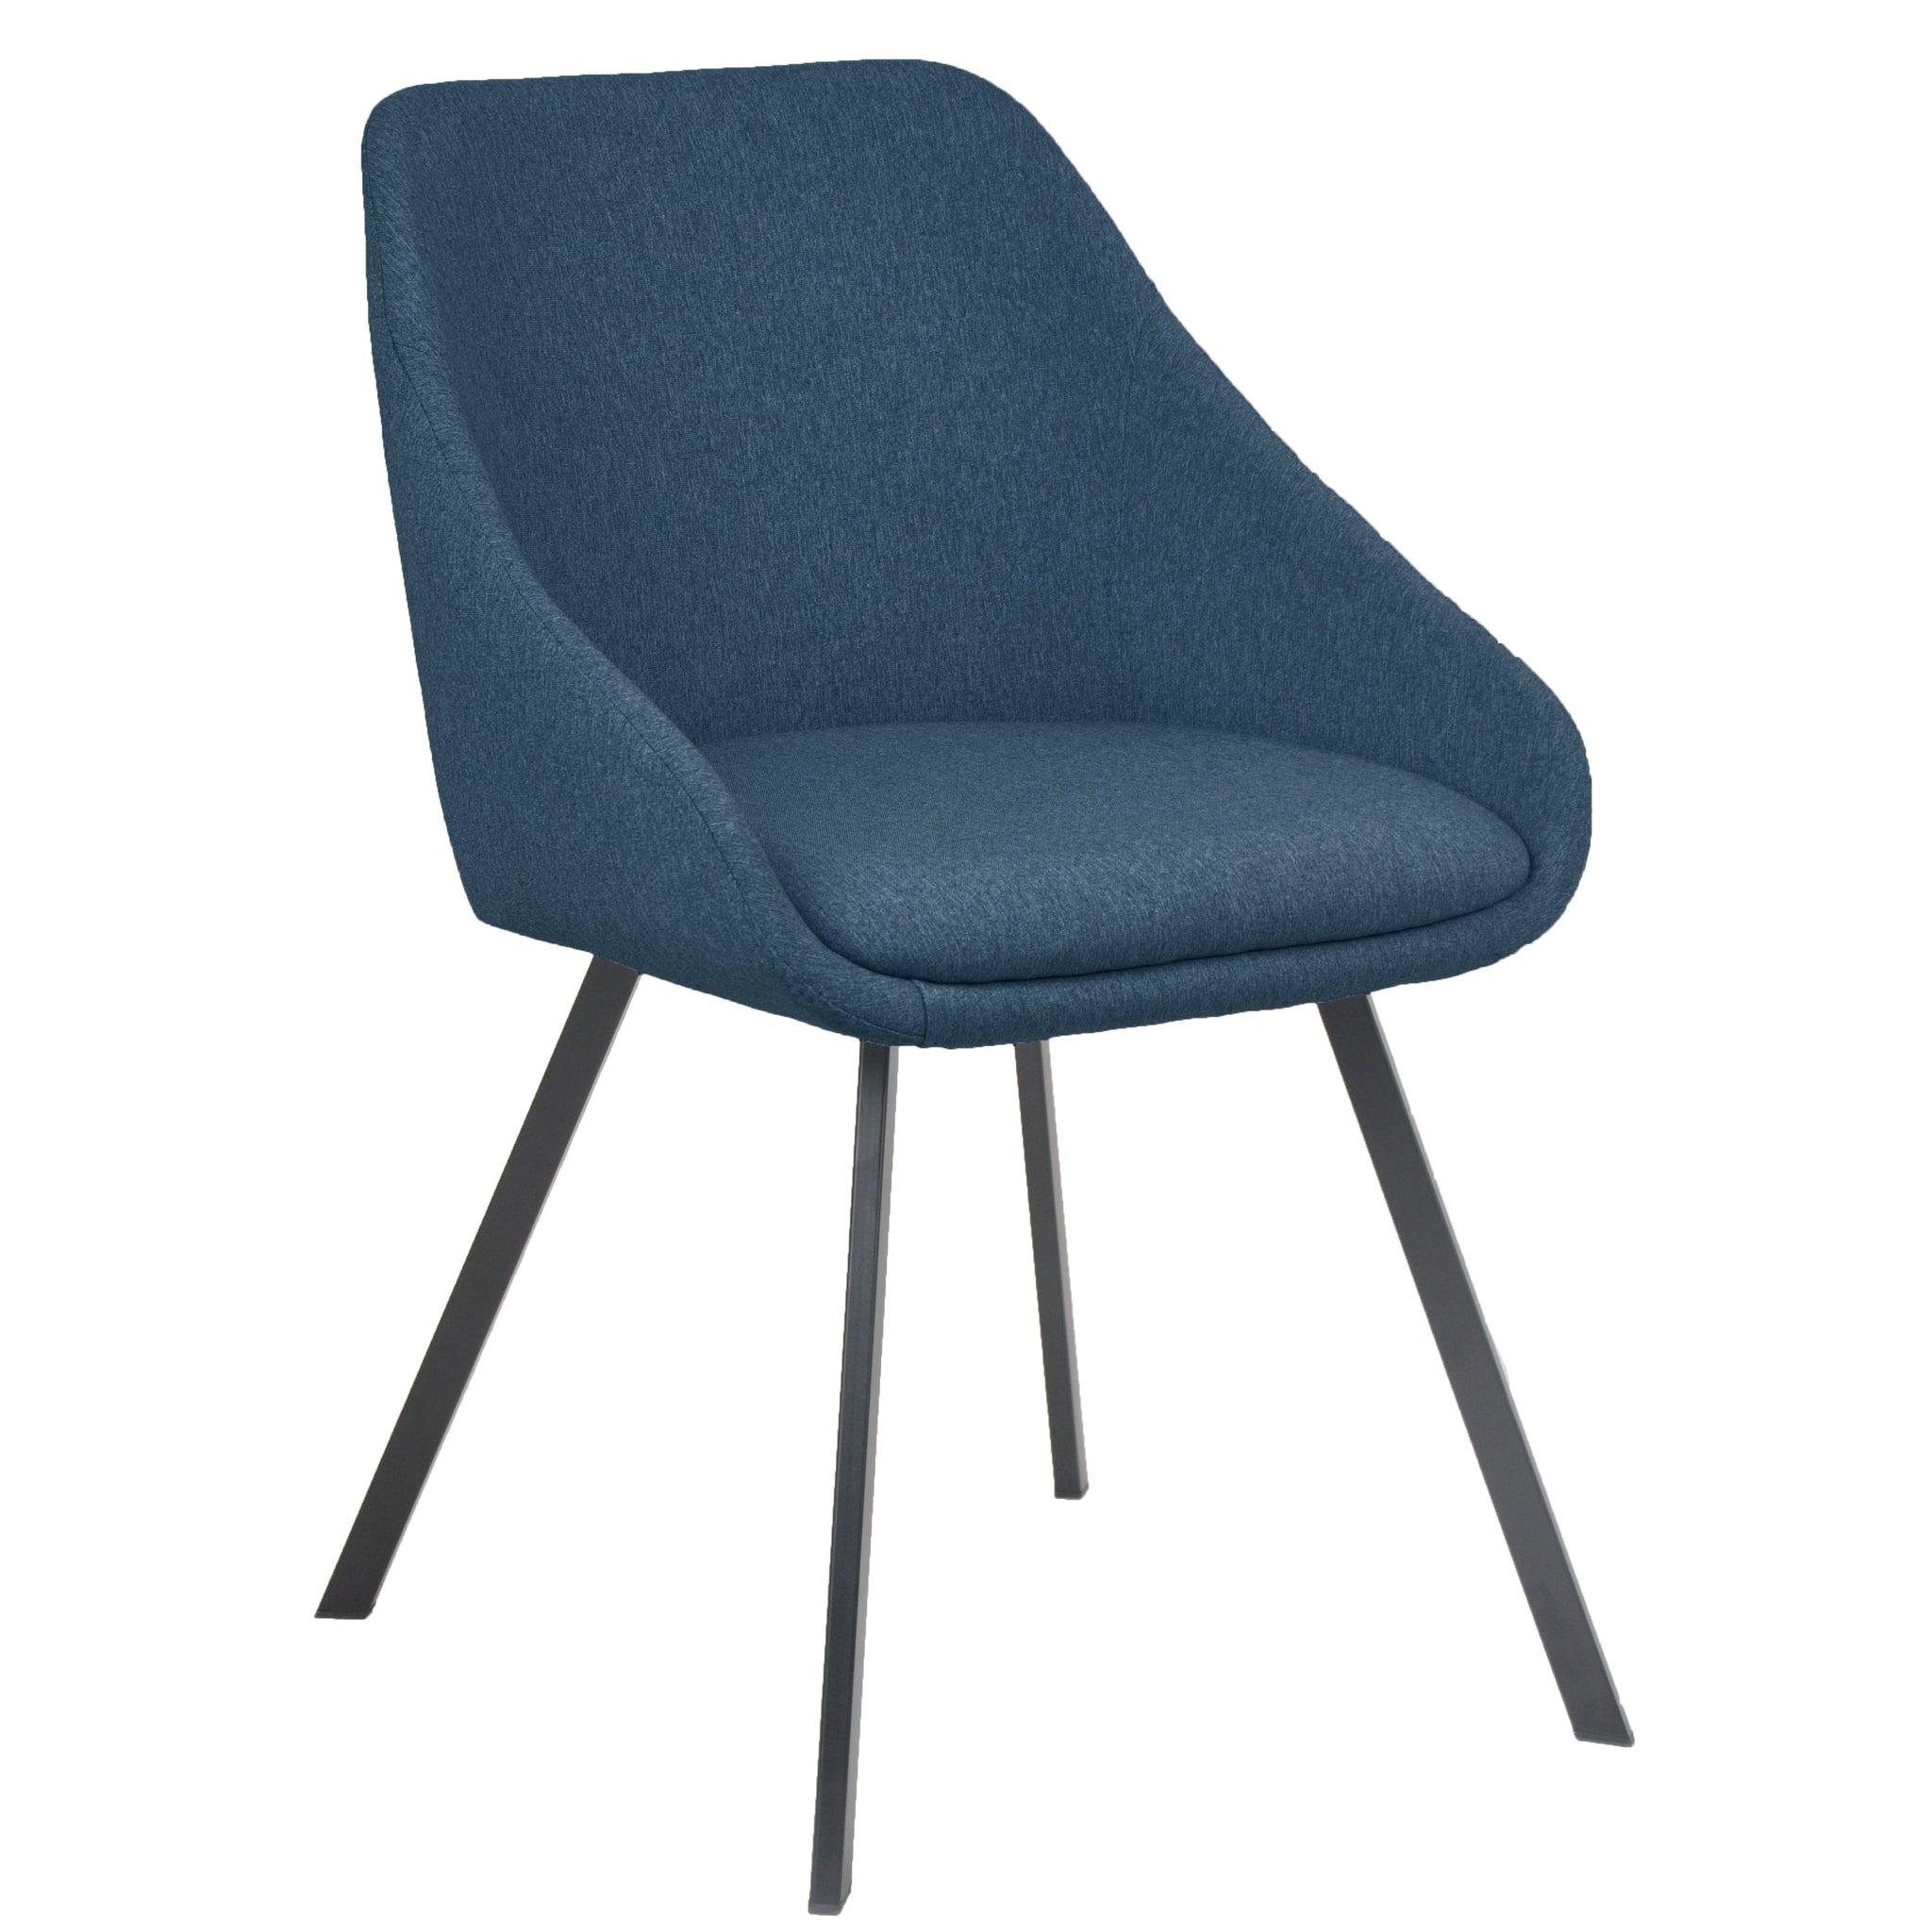 Nimara.dk Layla - Blå Polstret Spisebordsstol